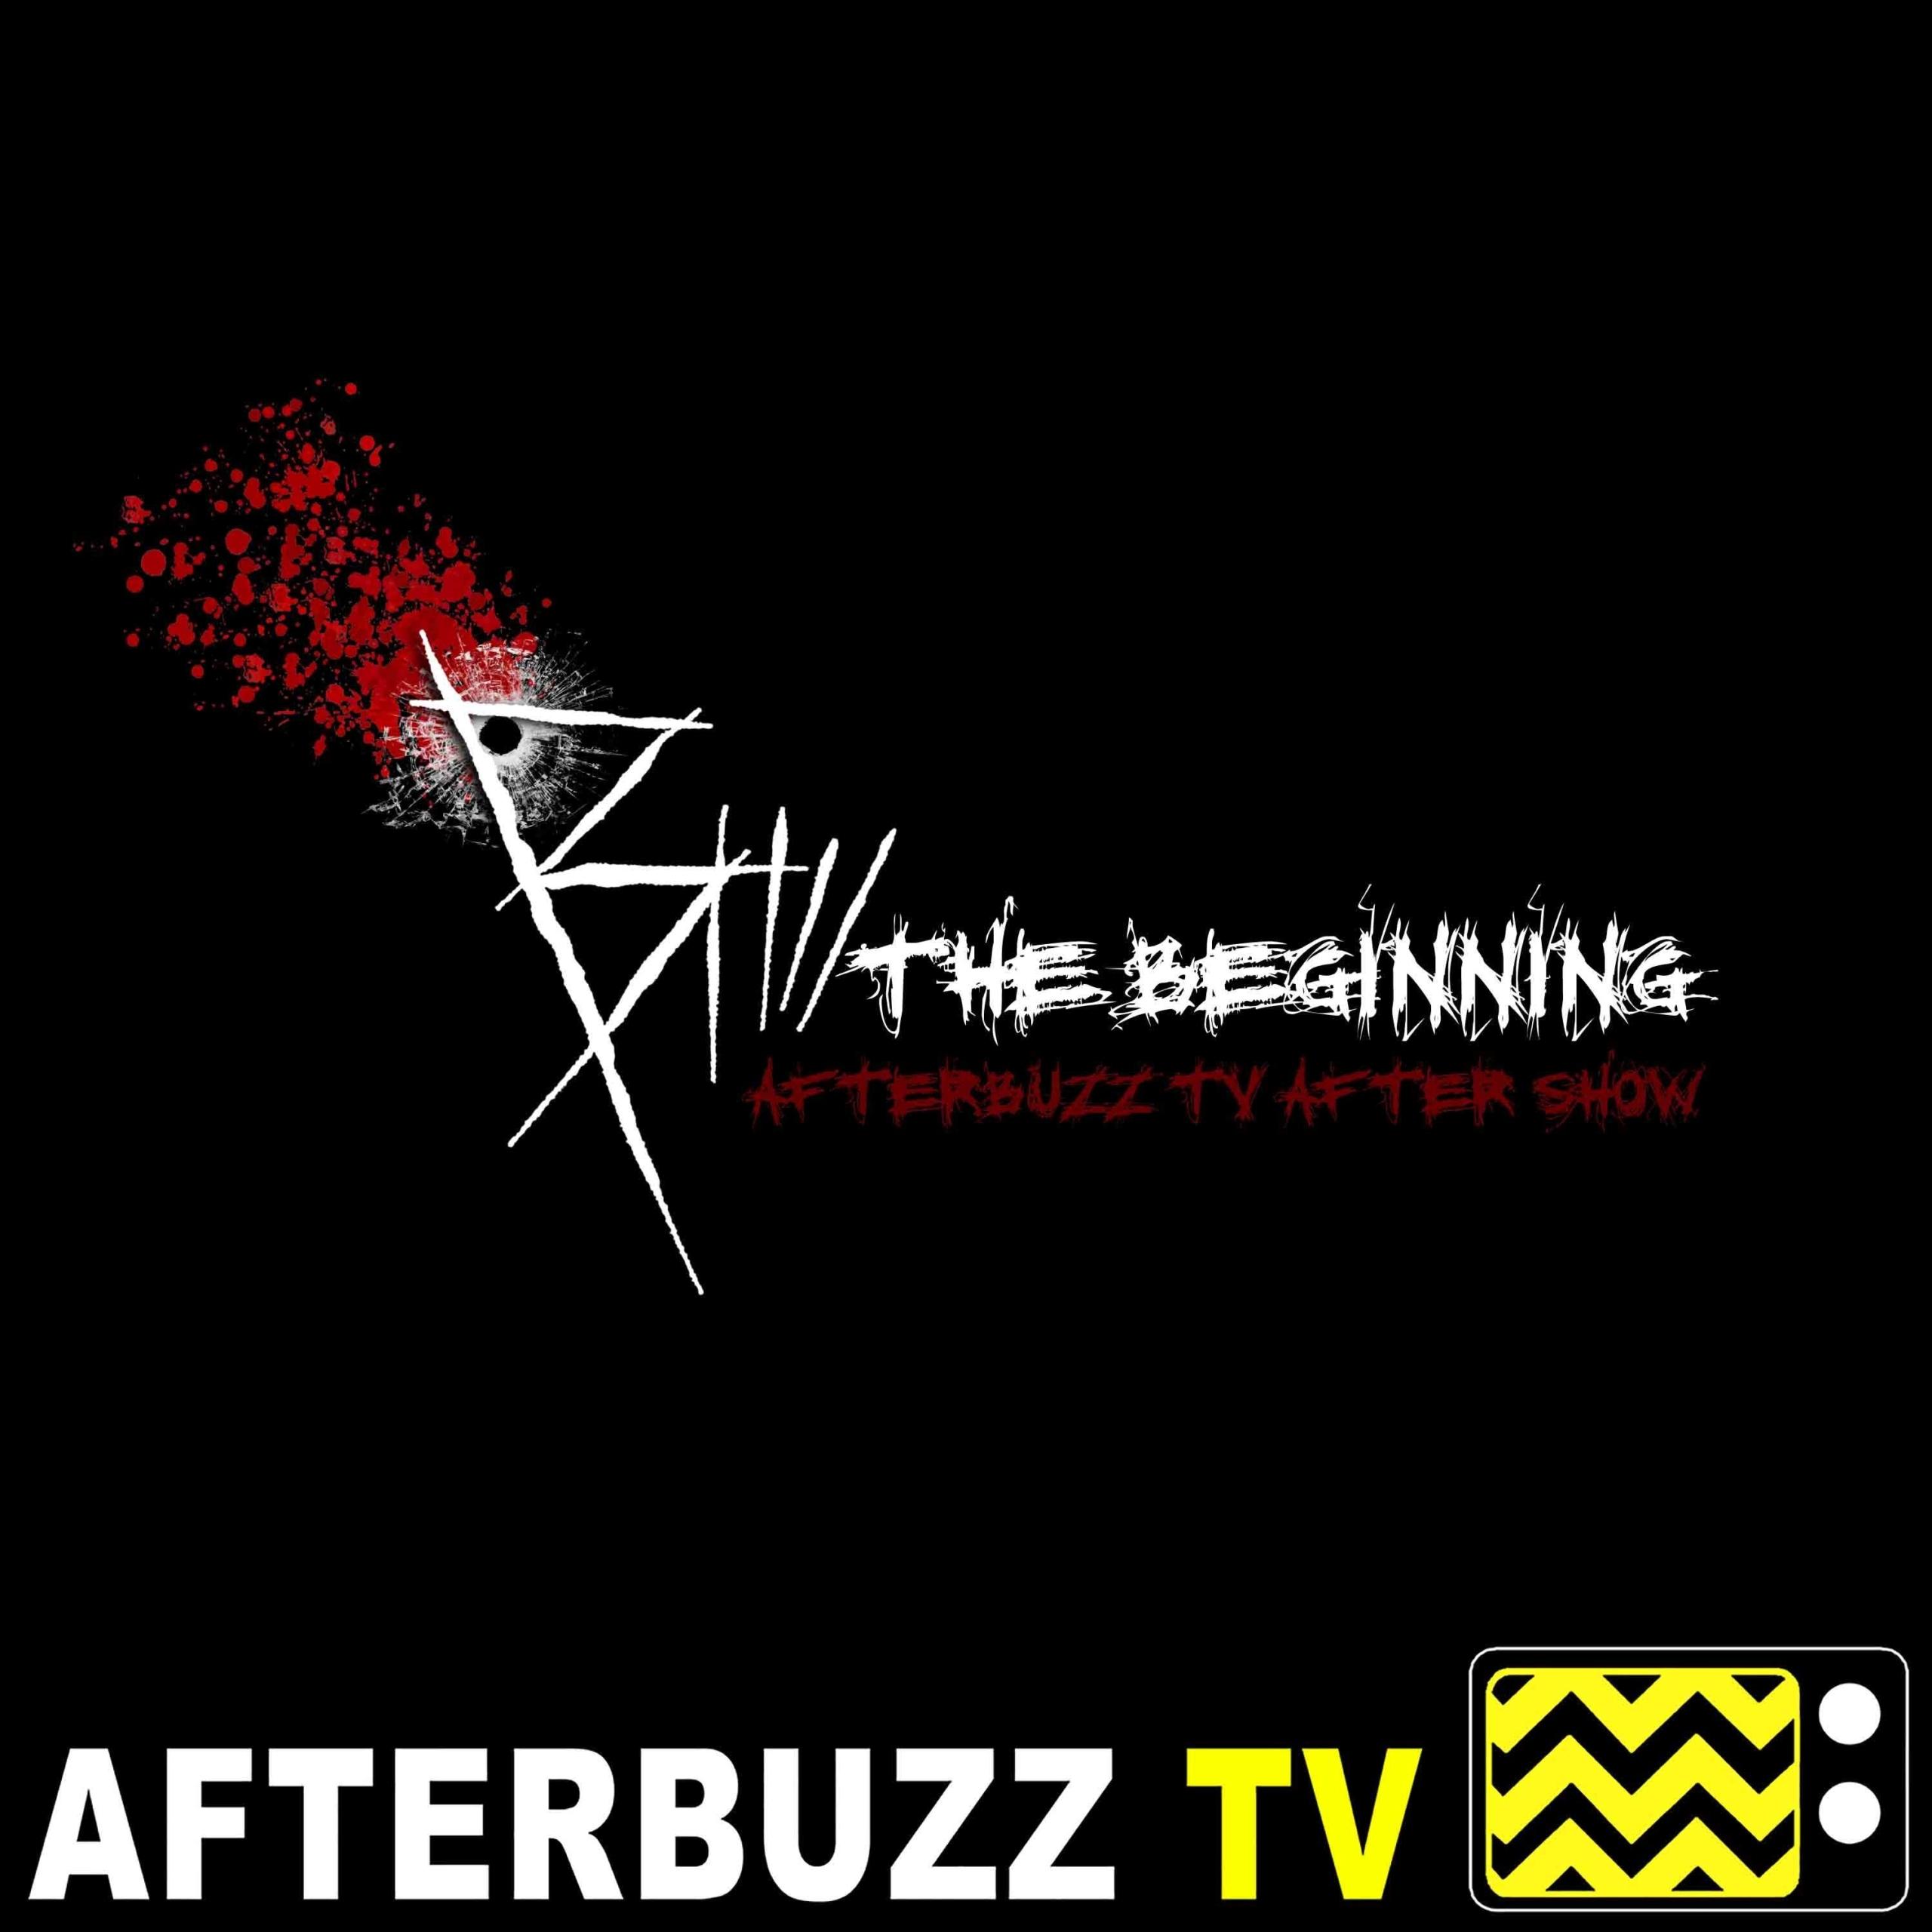 B: The Beginning S:1 | Ezra Weisz, Brianna Knickerbocker, & Faye Mata guests on Episodes 9 – 12 | AfterBuzz TV AfterShow